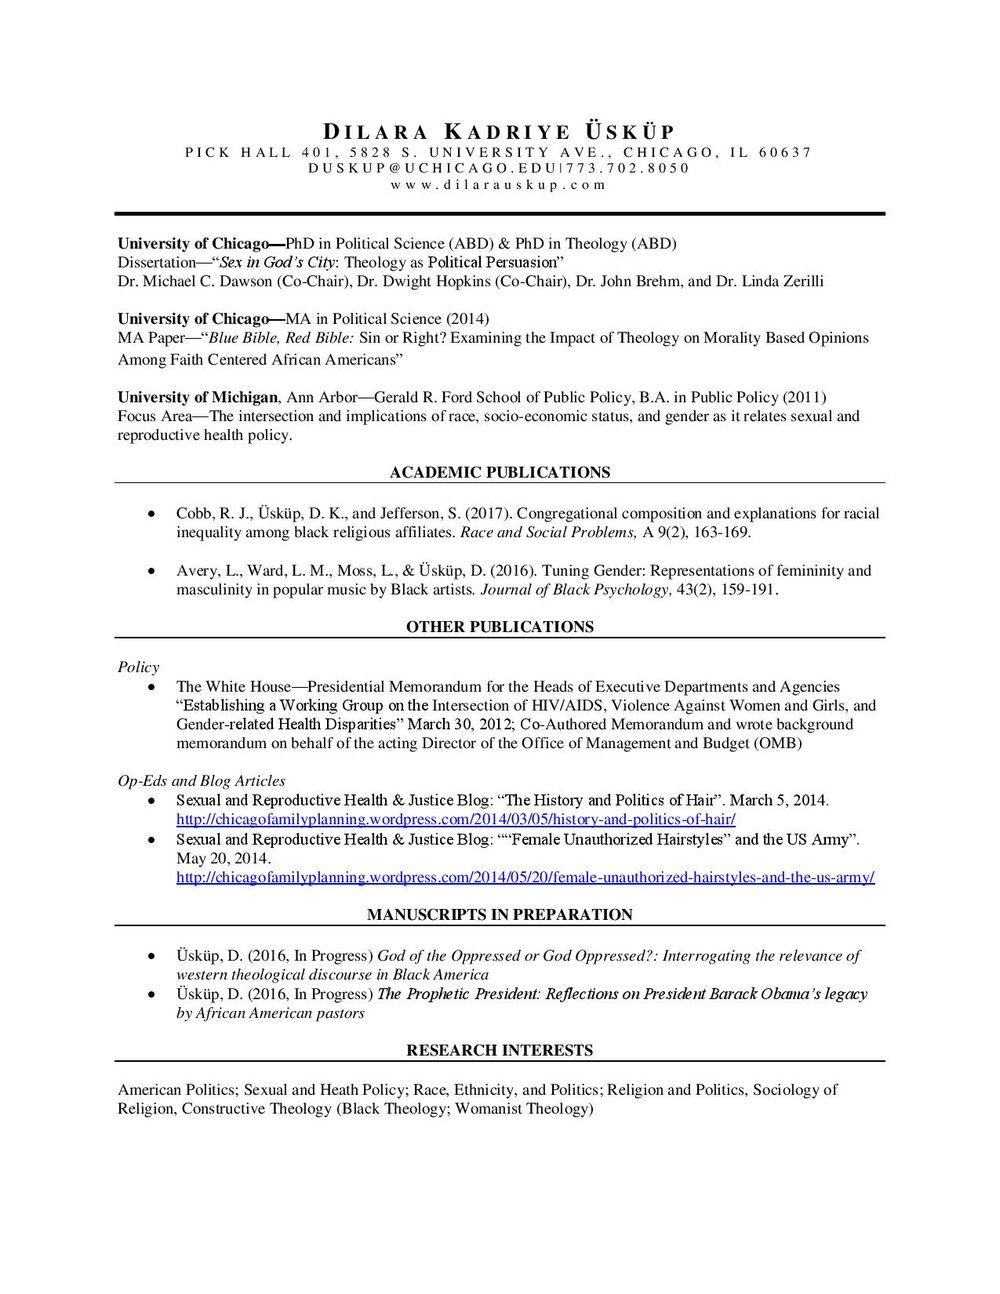 DKU CV public-page-001 (1).jpg